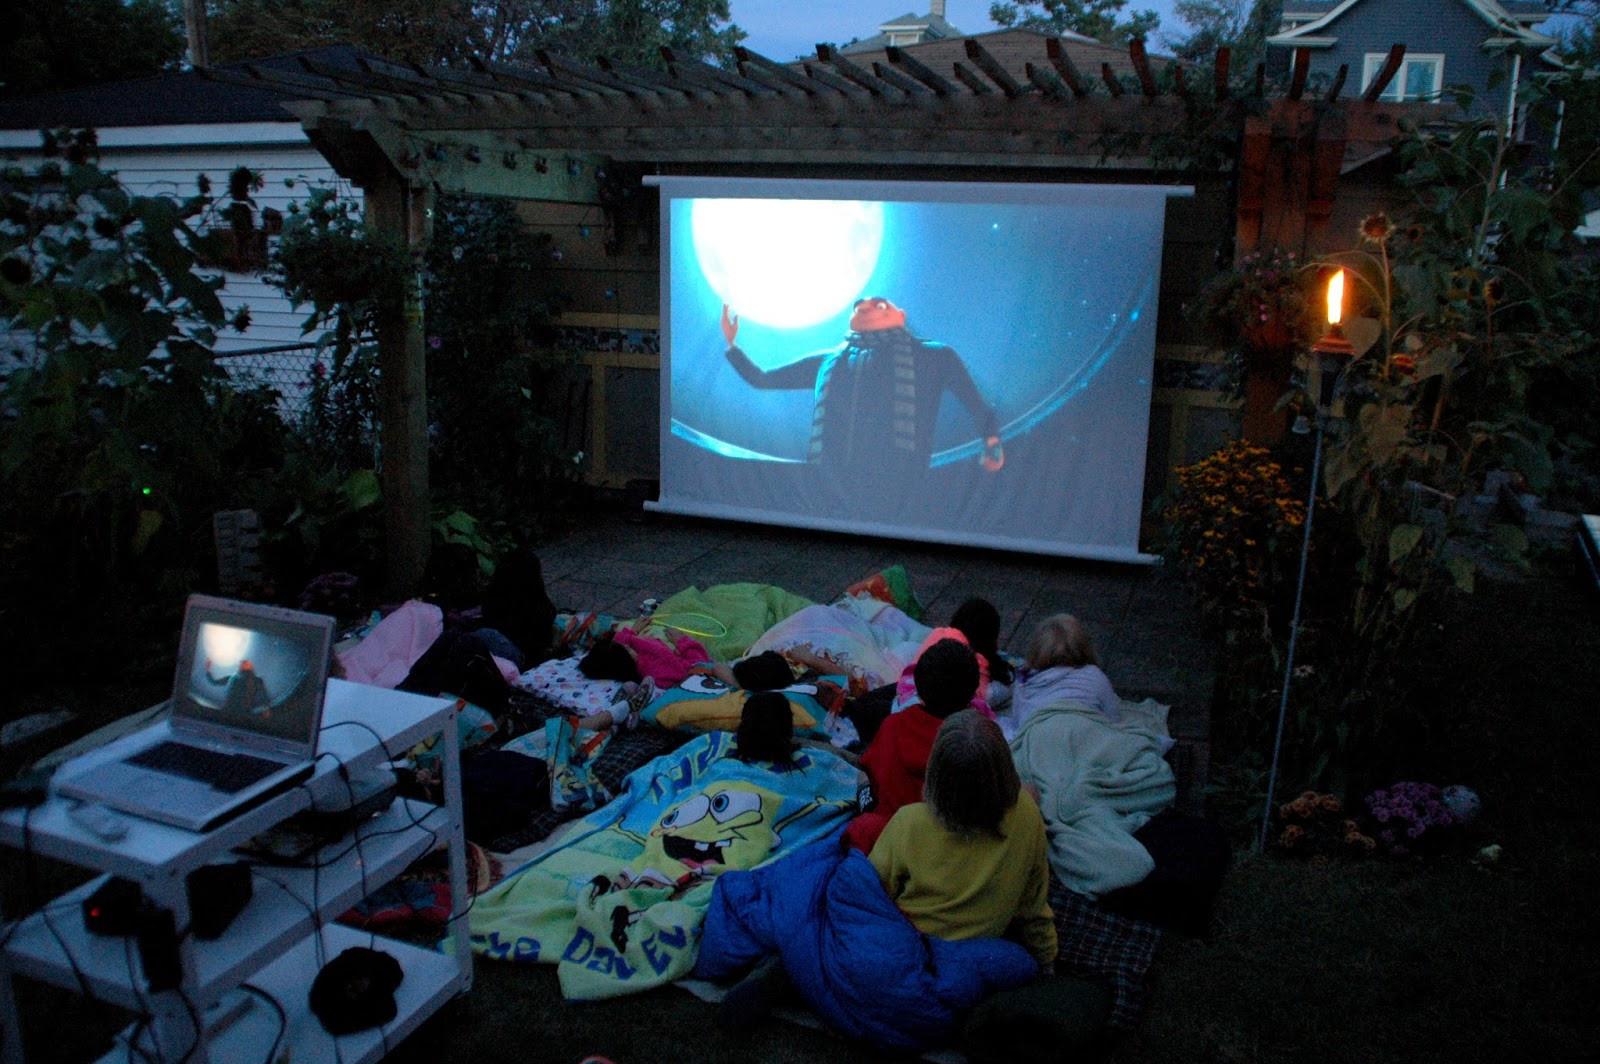 Outdoor Movie Screen DIY  Our Tiny Oak Park Bungalow DIY Outdoor Movie Screen